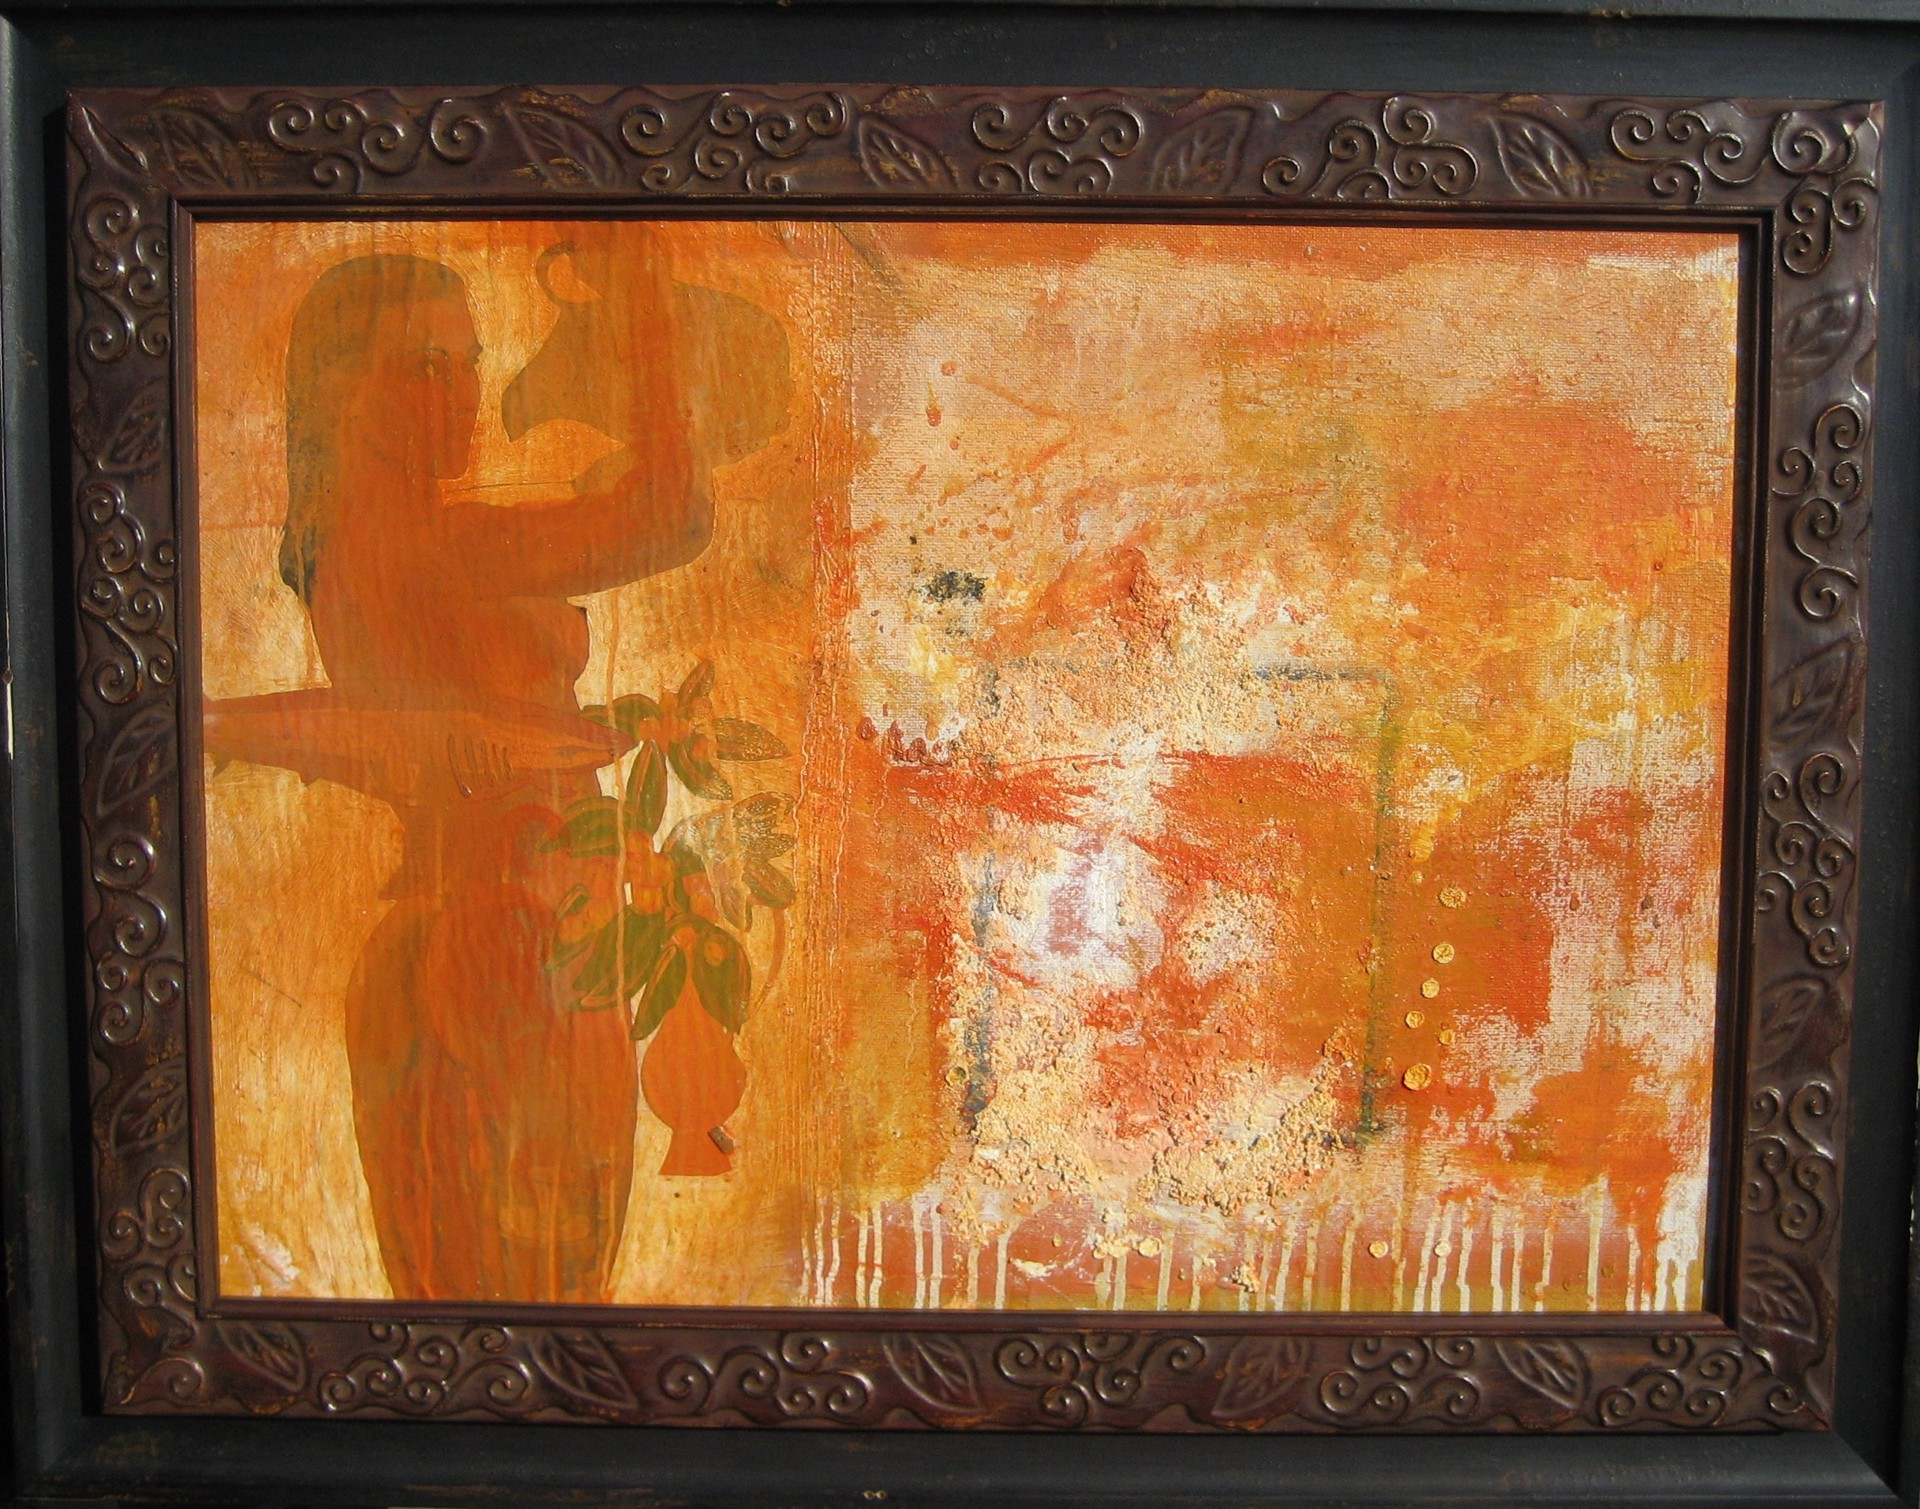 Frau mit Kanne...Belebt die Sinne Woman with Pitcher...Revive the Senses by Hans Joerg Fuerpass